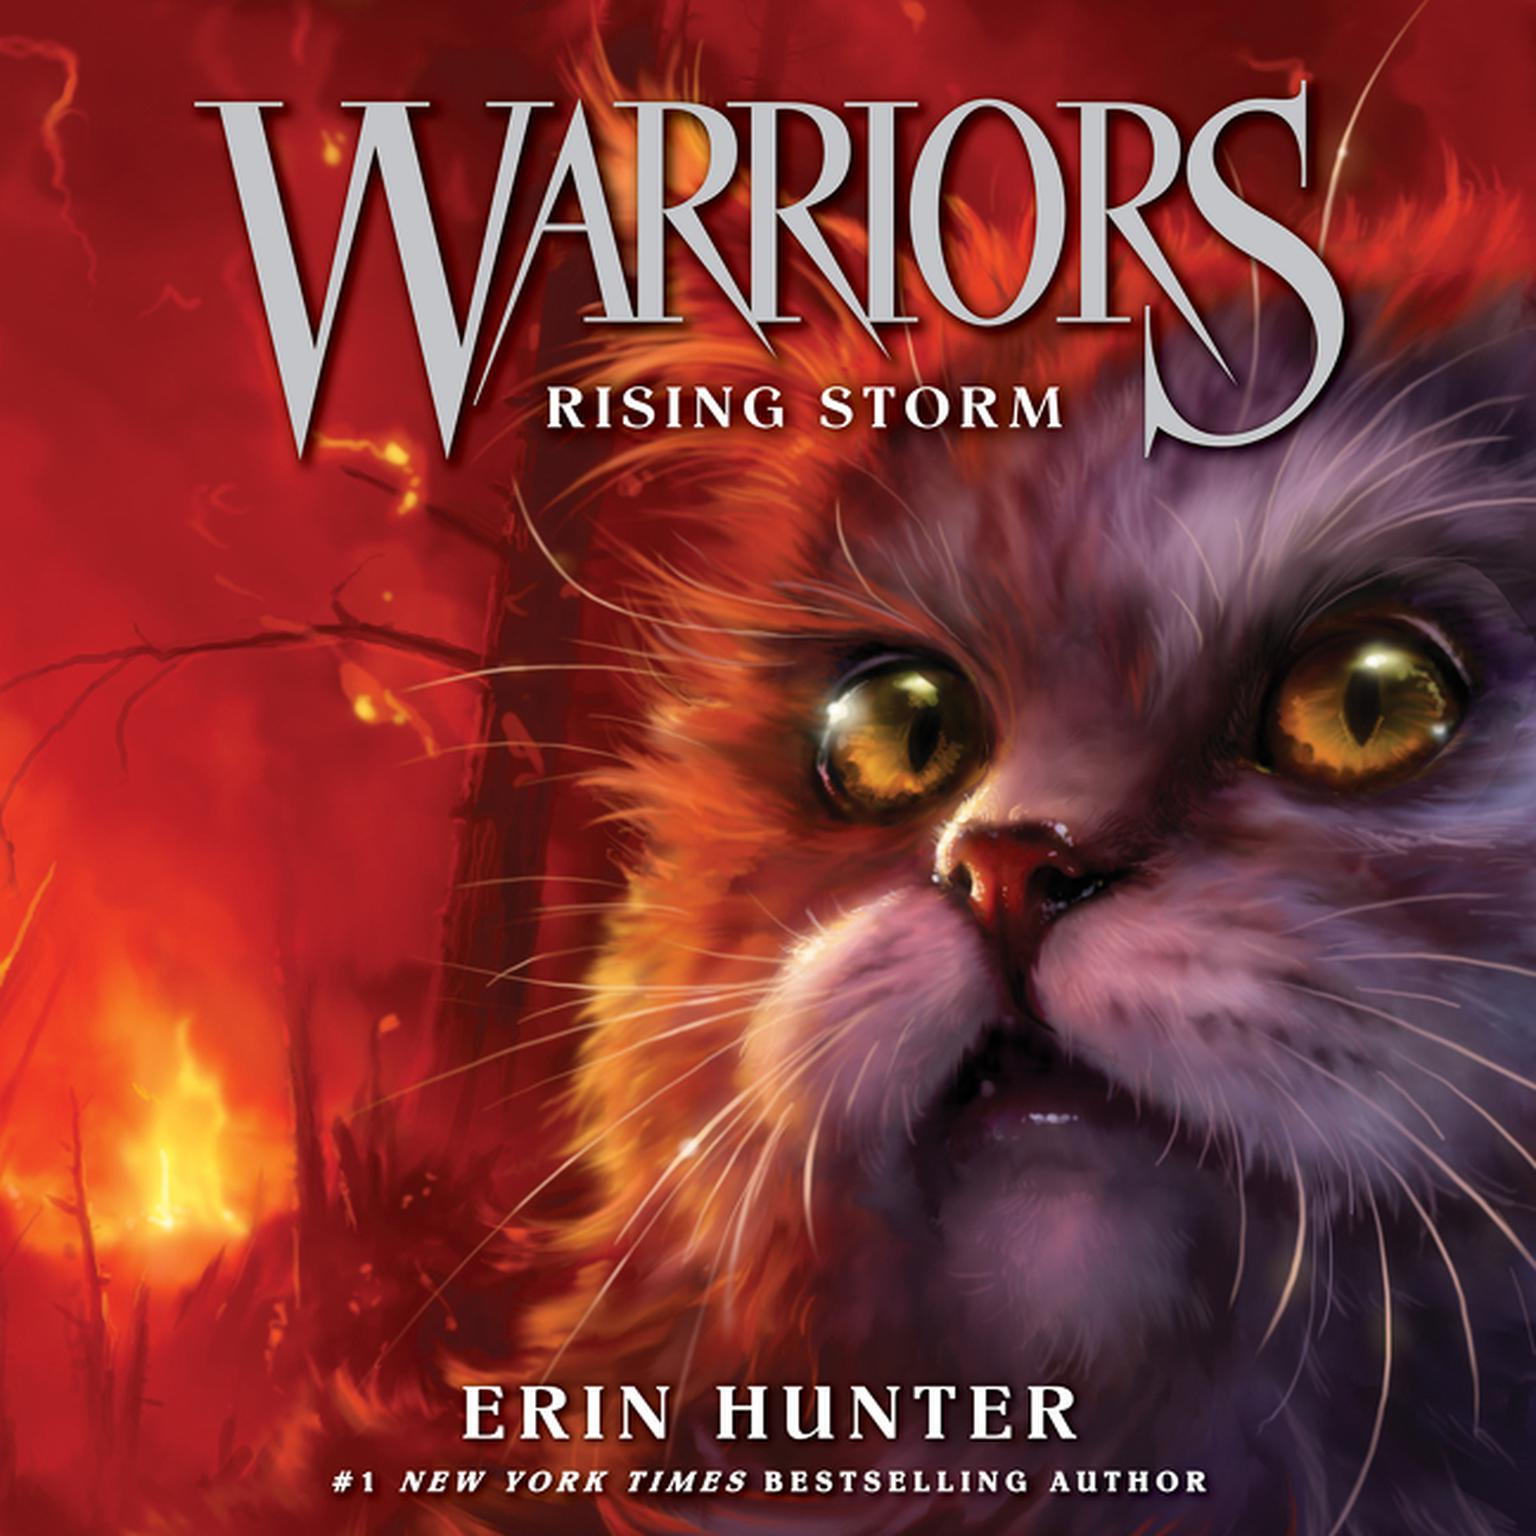 Warriors #4: Rising Storm Audiobook, by Erin Hunter